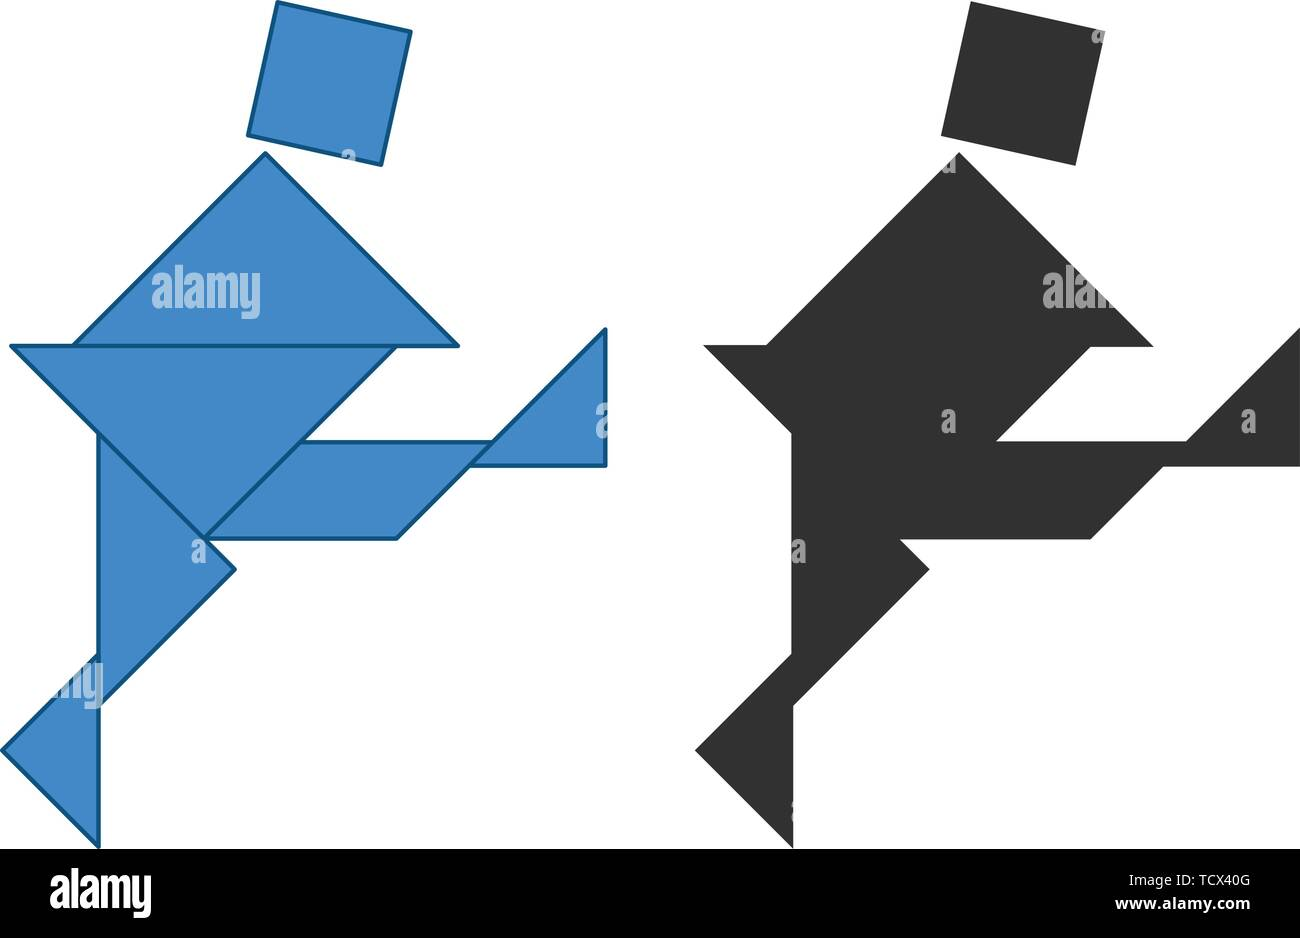 Seven Pieces Stock Photos & Seven Pieces Stock Images - Alamy